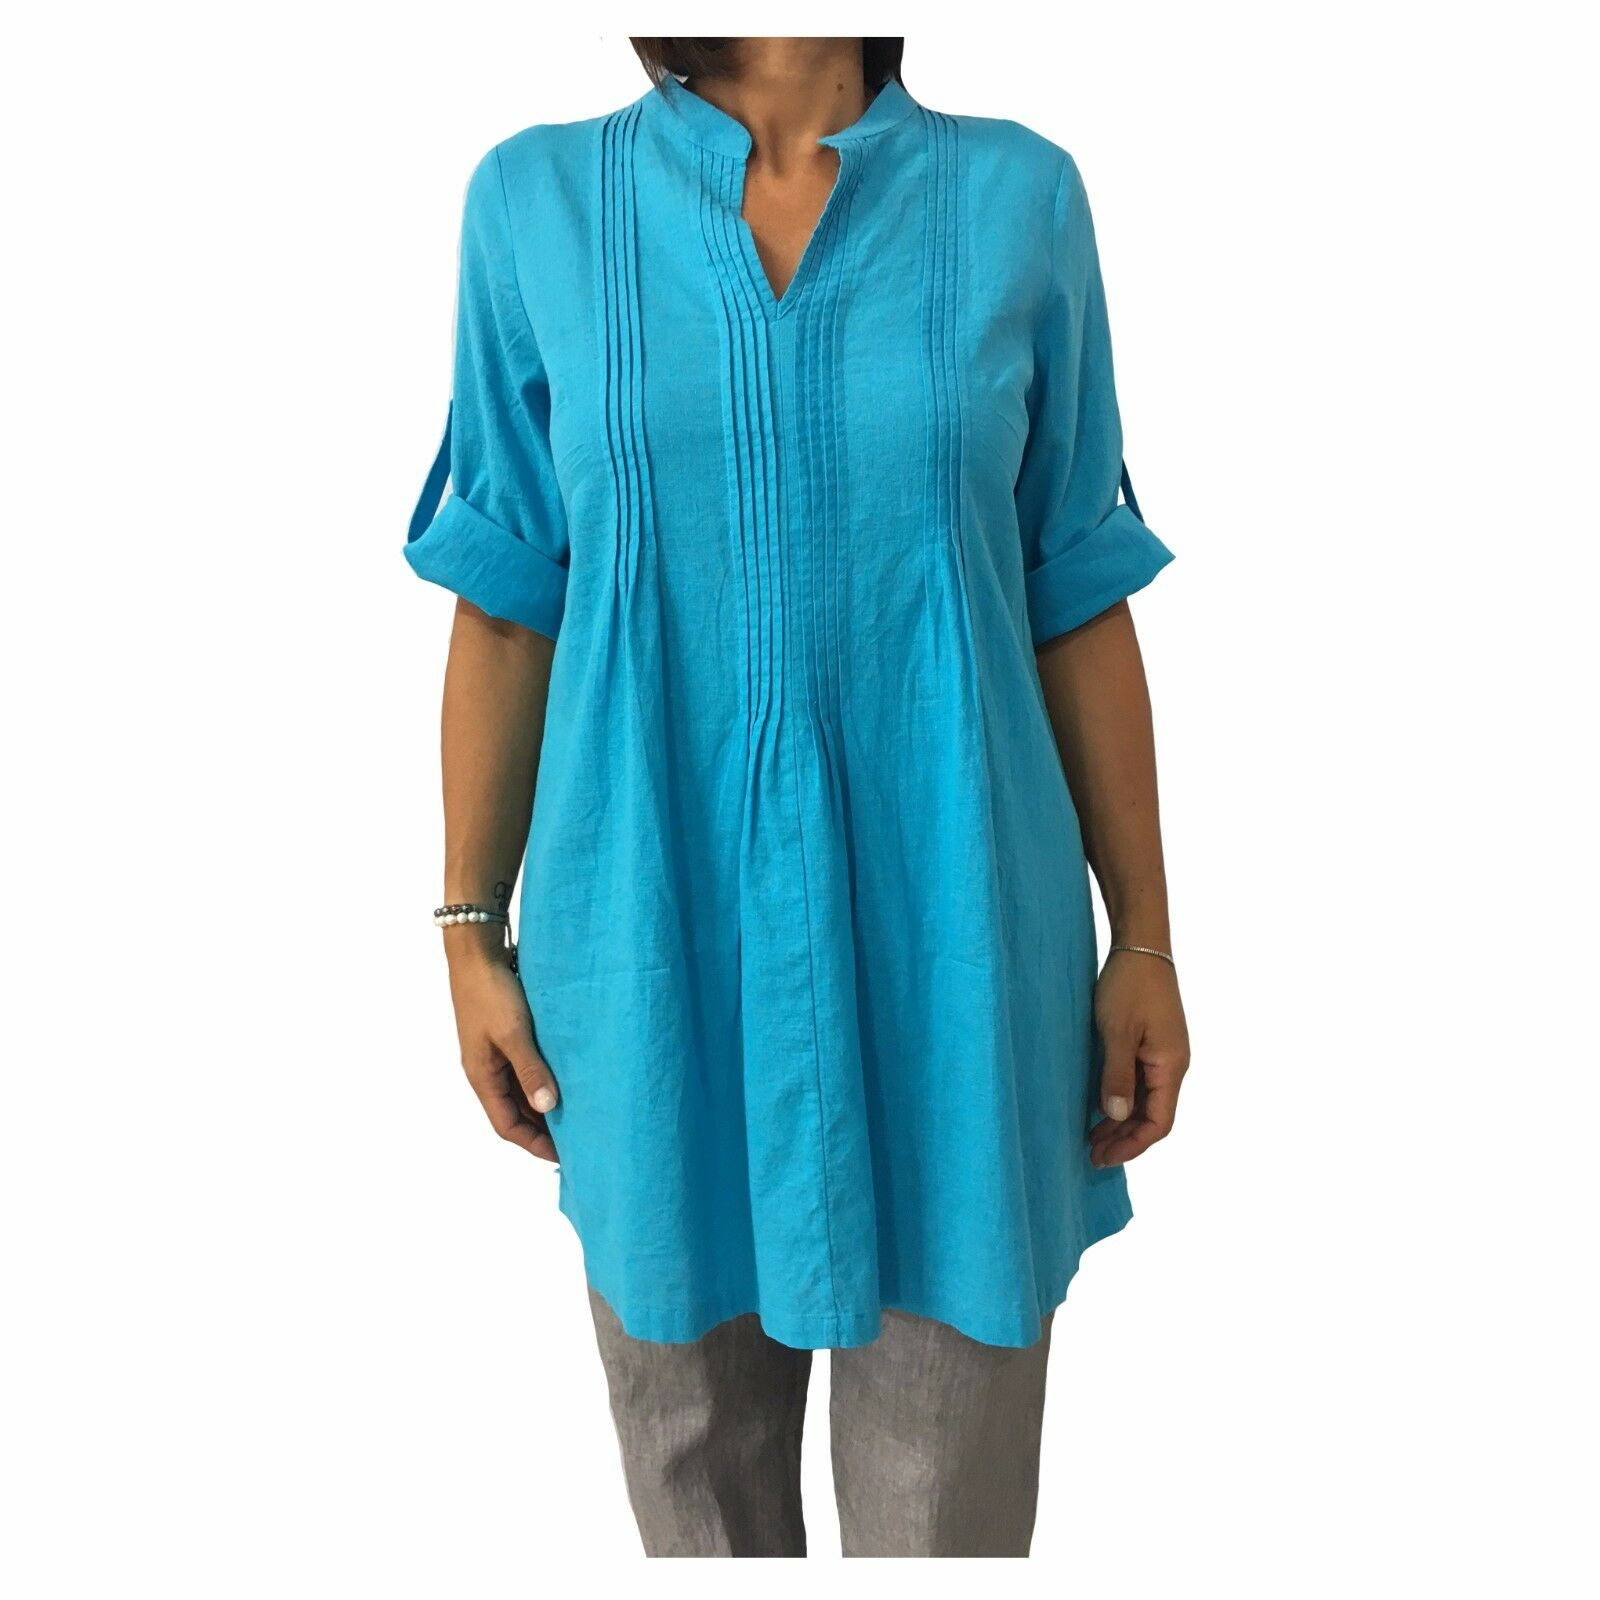 Damenhemd over türkis AND Material  52% Leinen 48% Baumwolle